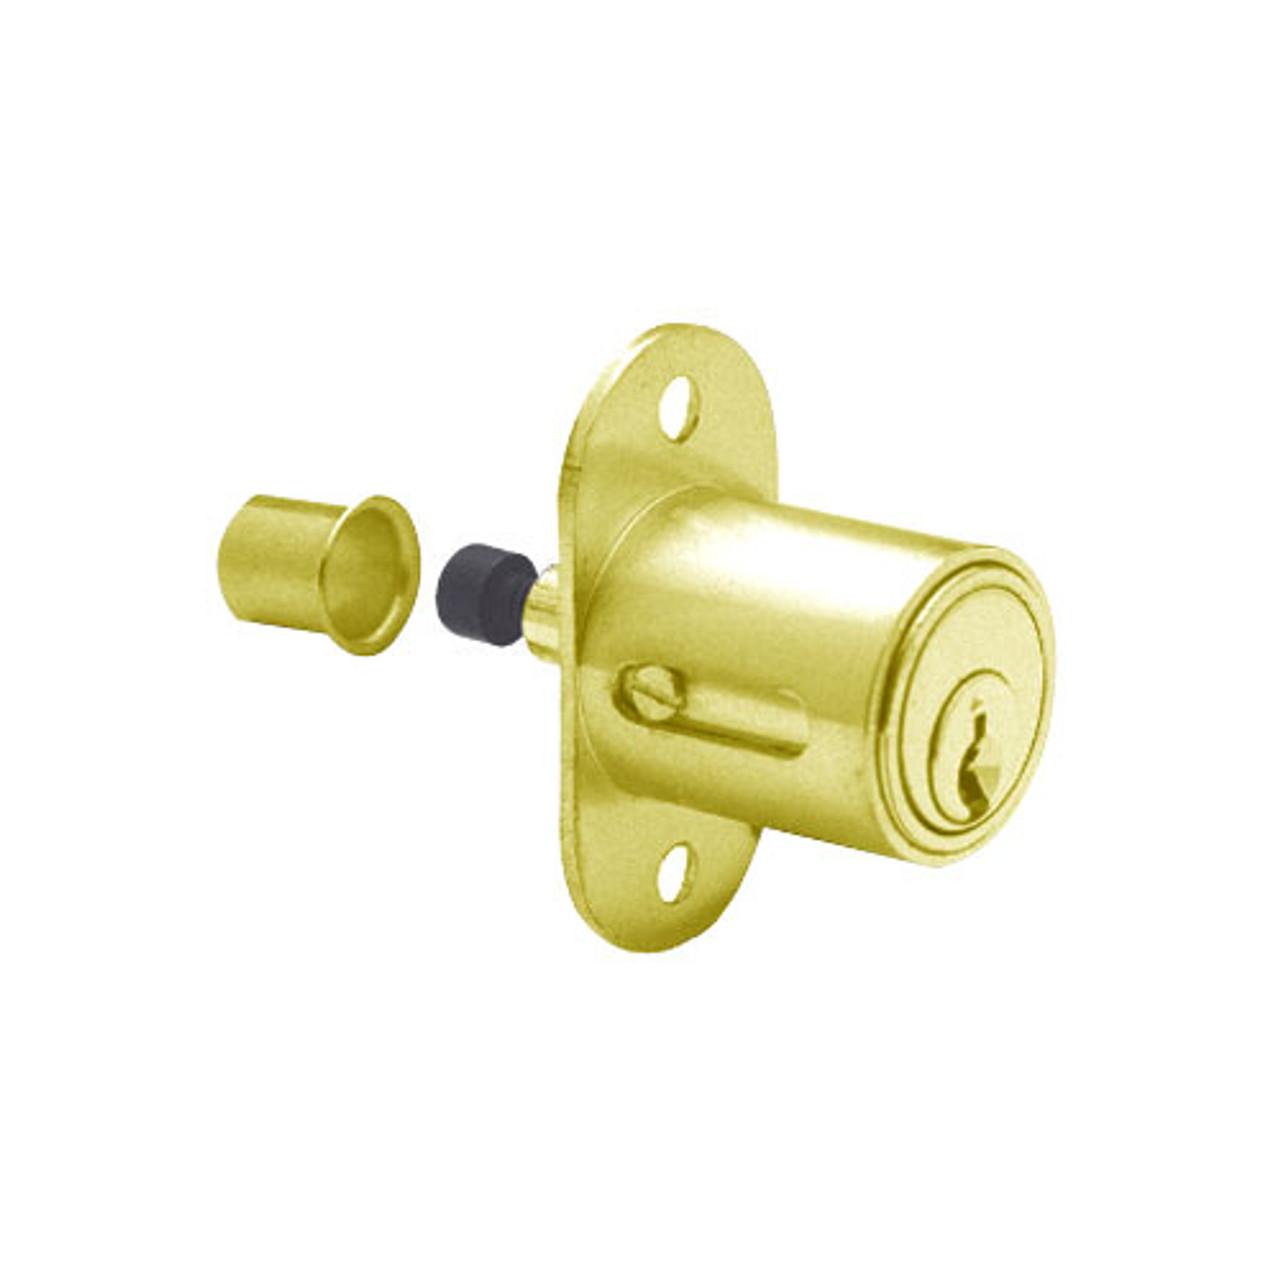 Olympus 400SD-KD-US3 Plunger Locks in Bright Brass Finish